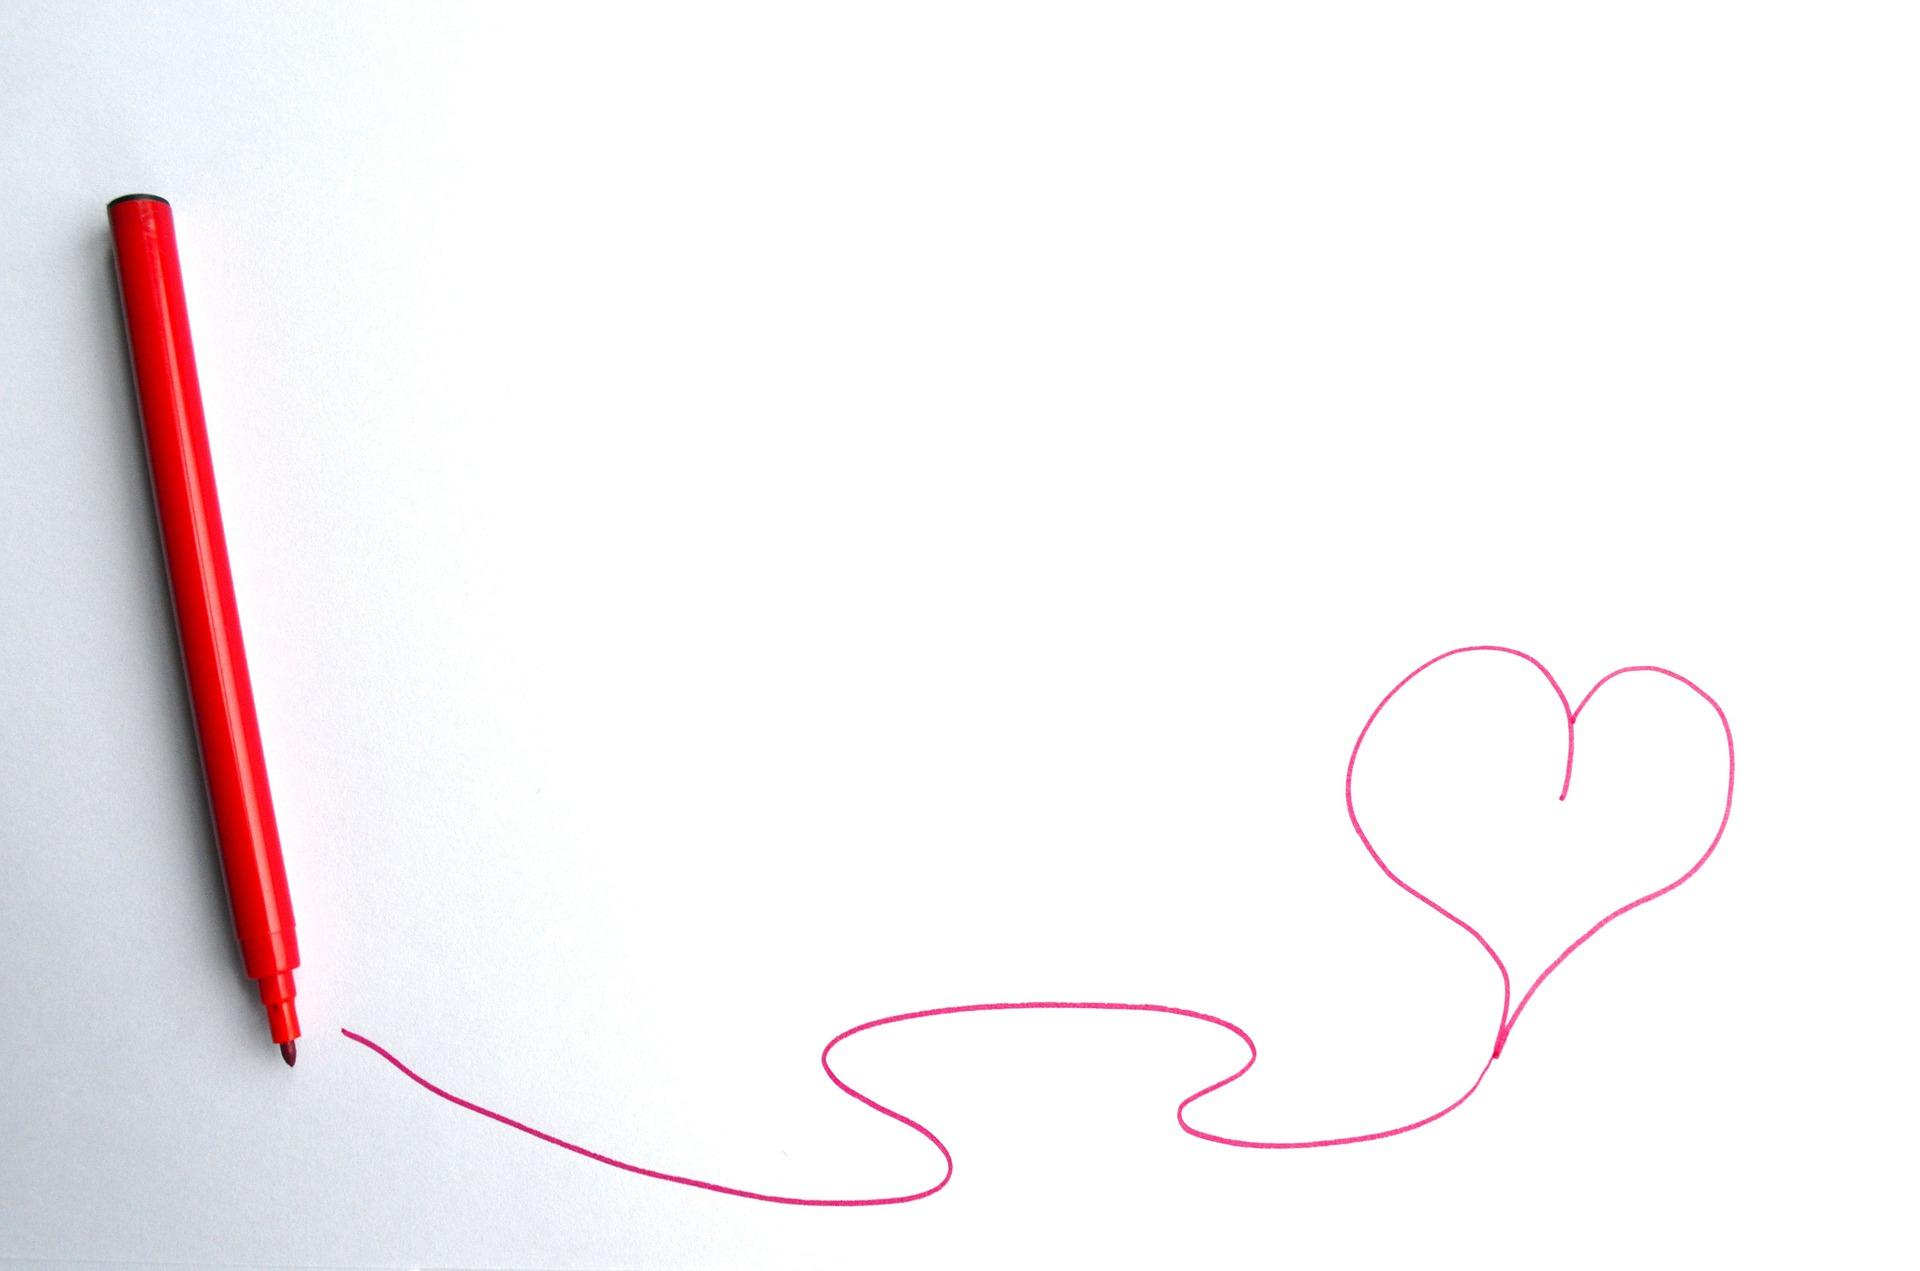 heart-19838_1920